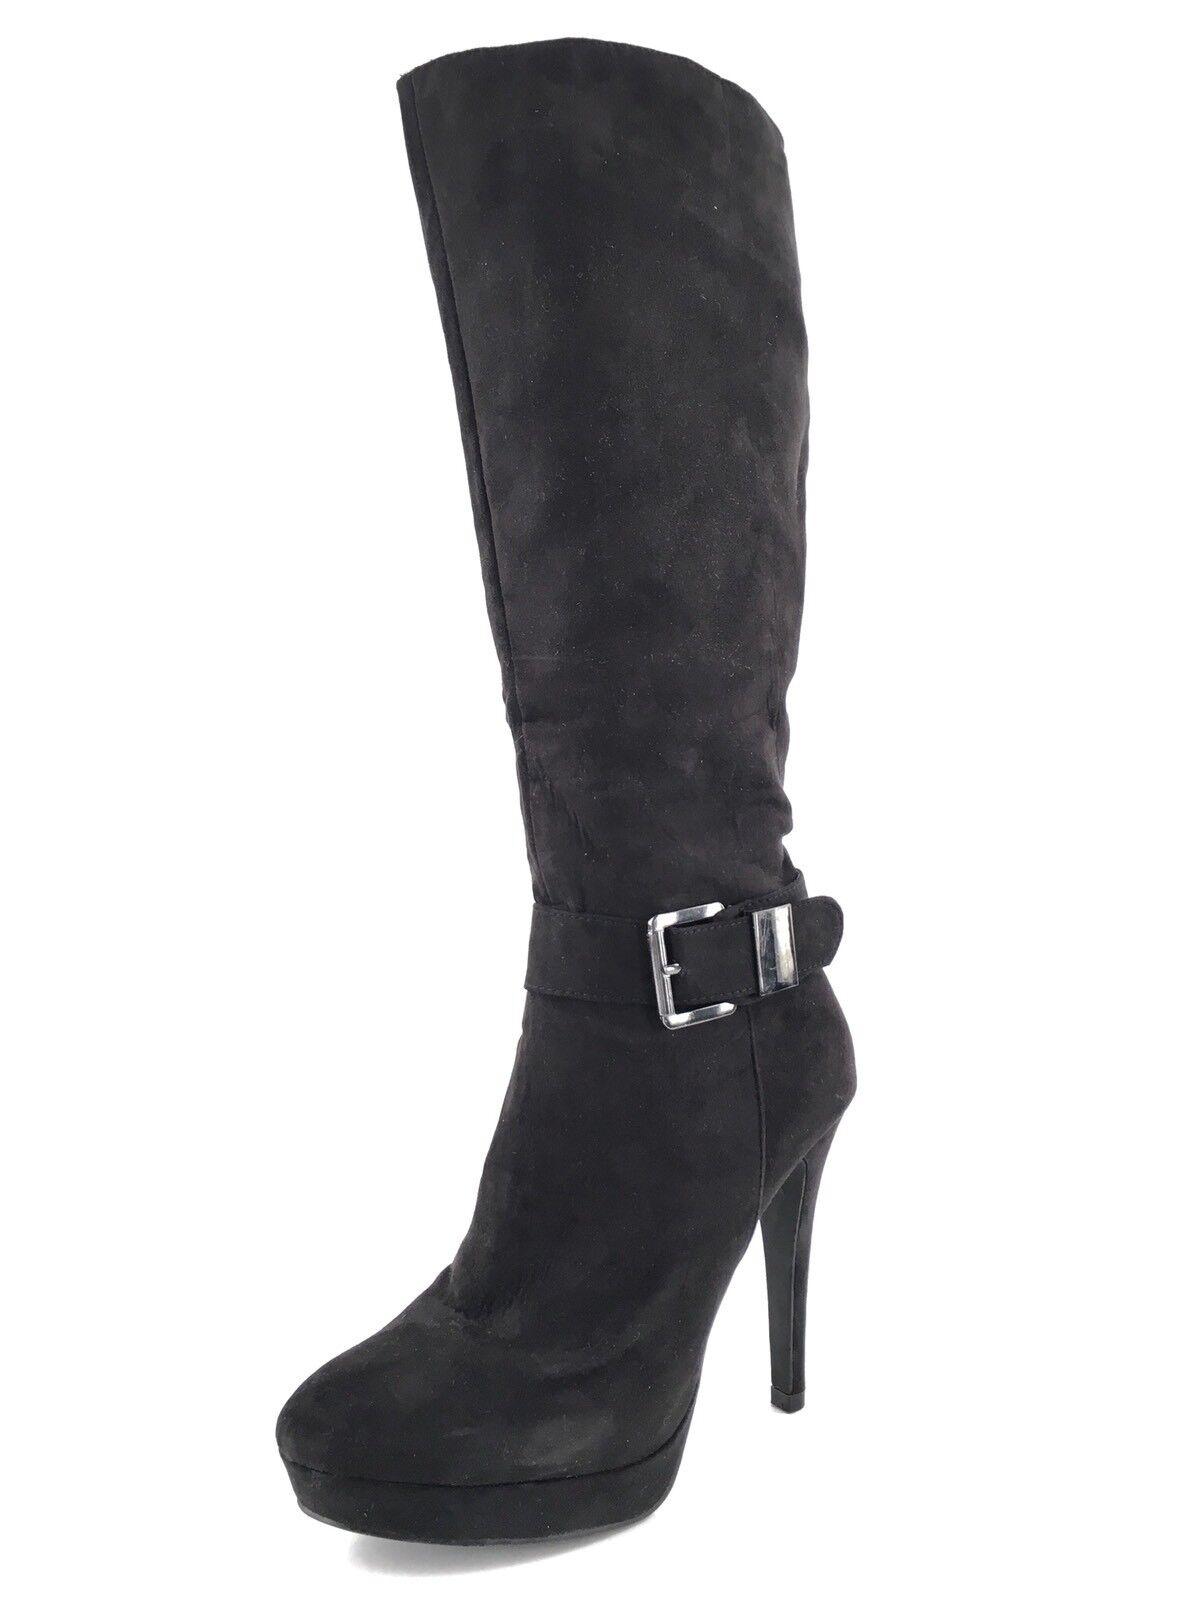 2 LIPS TOO Too Vista Black Platform Knee High Boots Women's Size 8.5 M *